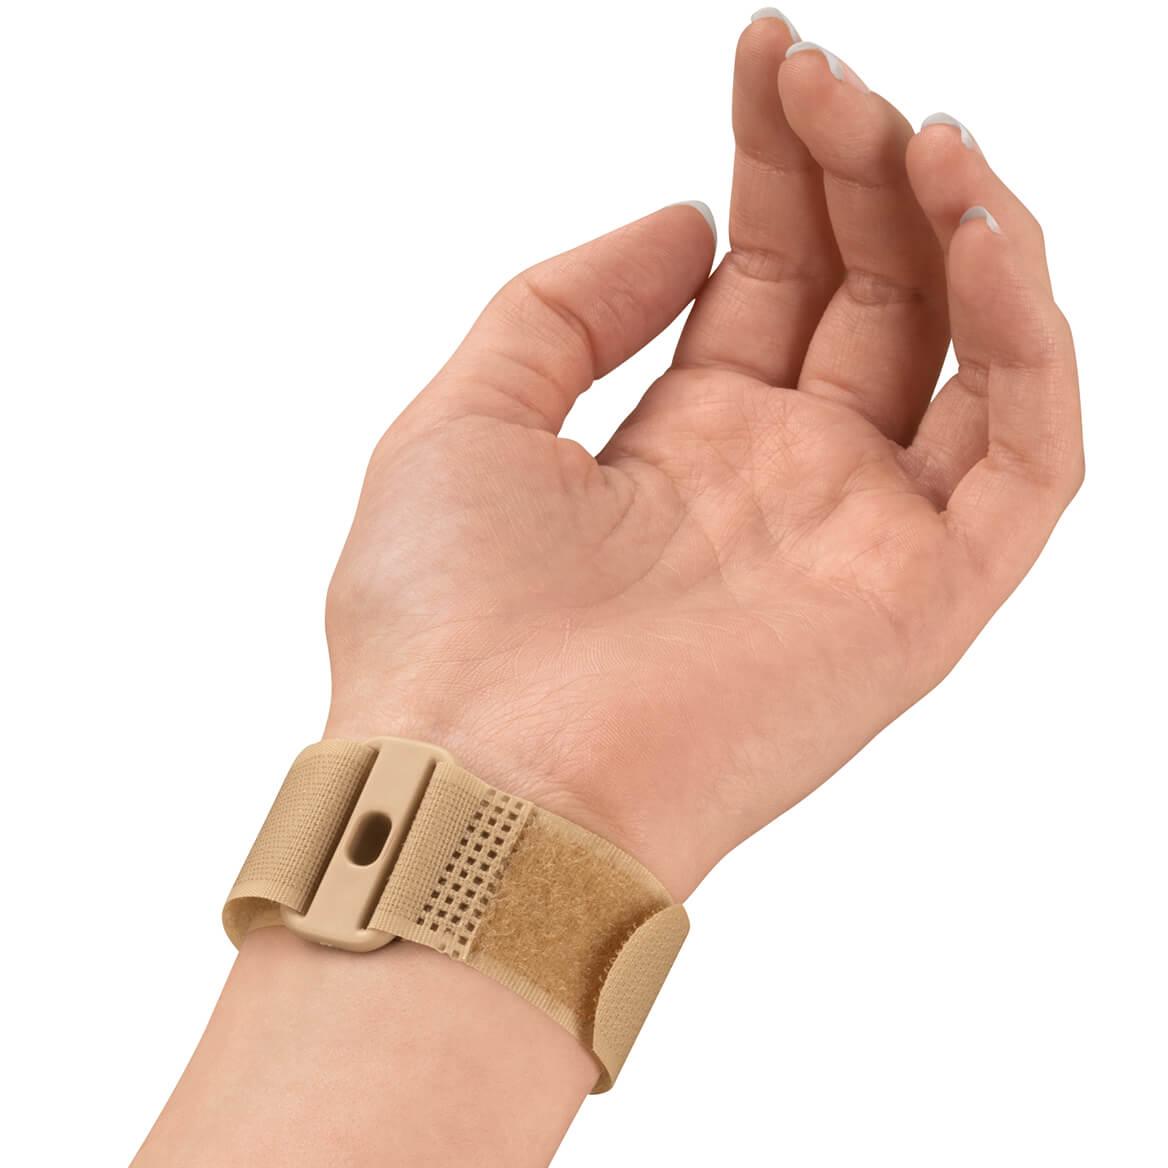 Acupressure Wrist Band-344956